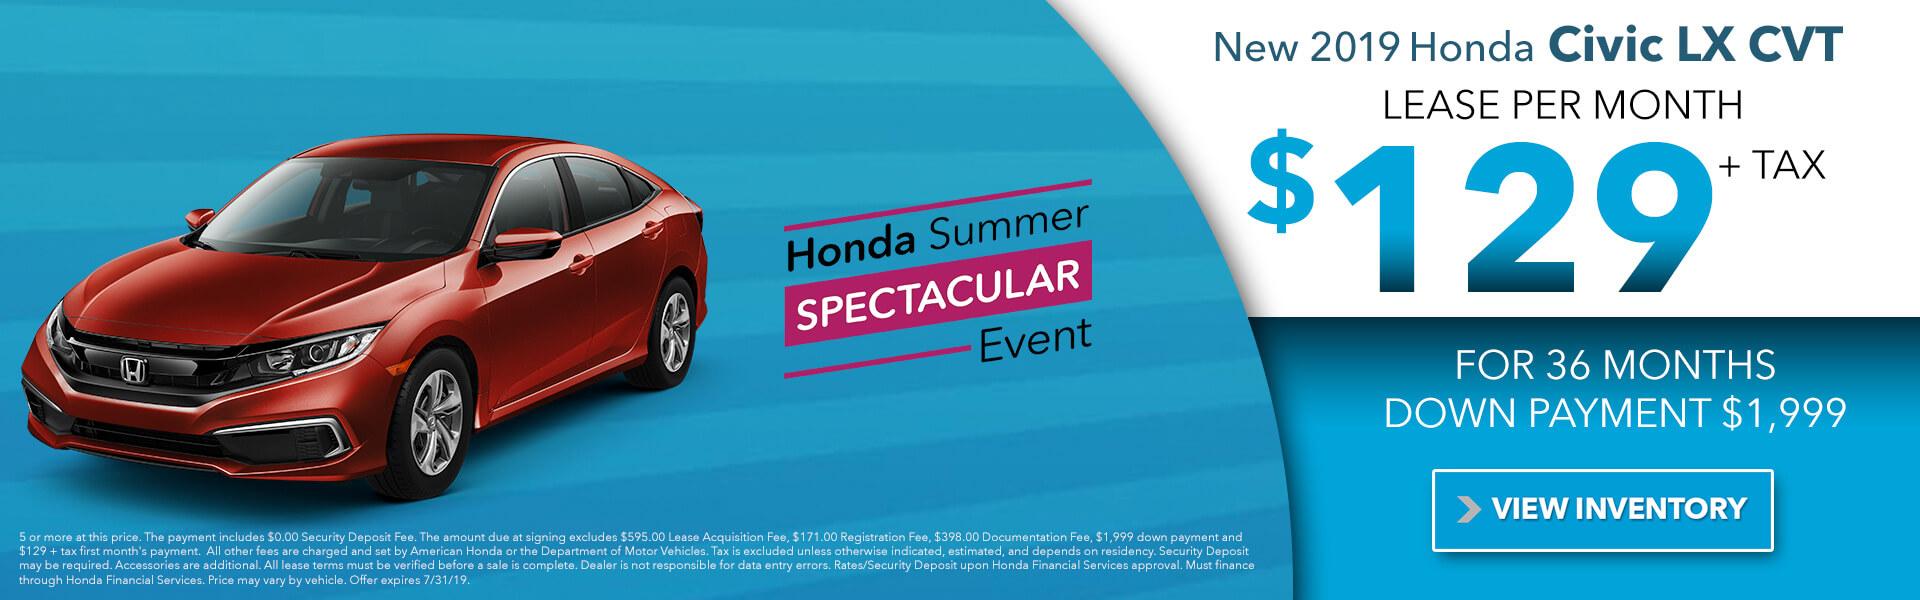 2019 Honda Civic LX CVT $129 per month